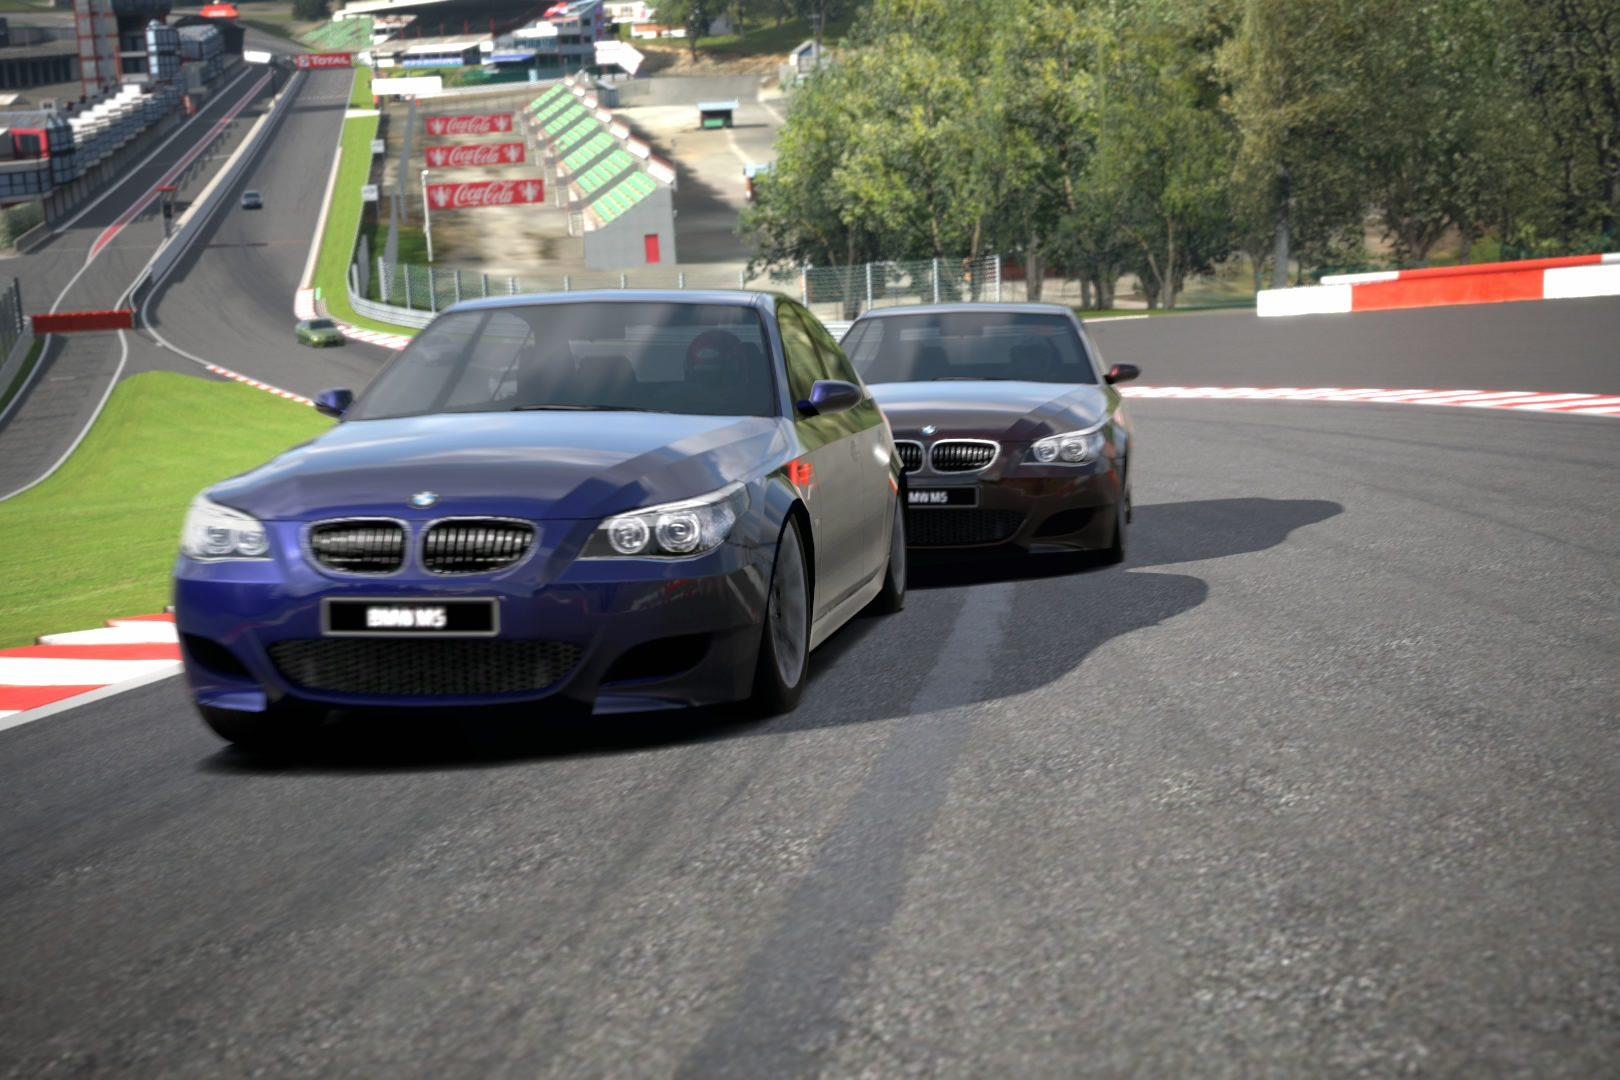 Circuit de Spa-Francorchamps_11.jpg